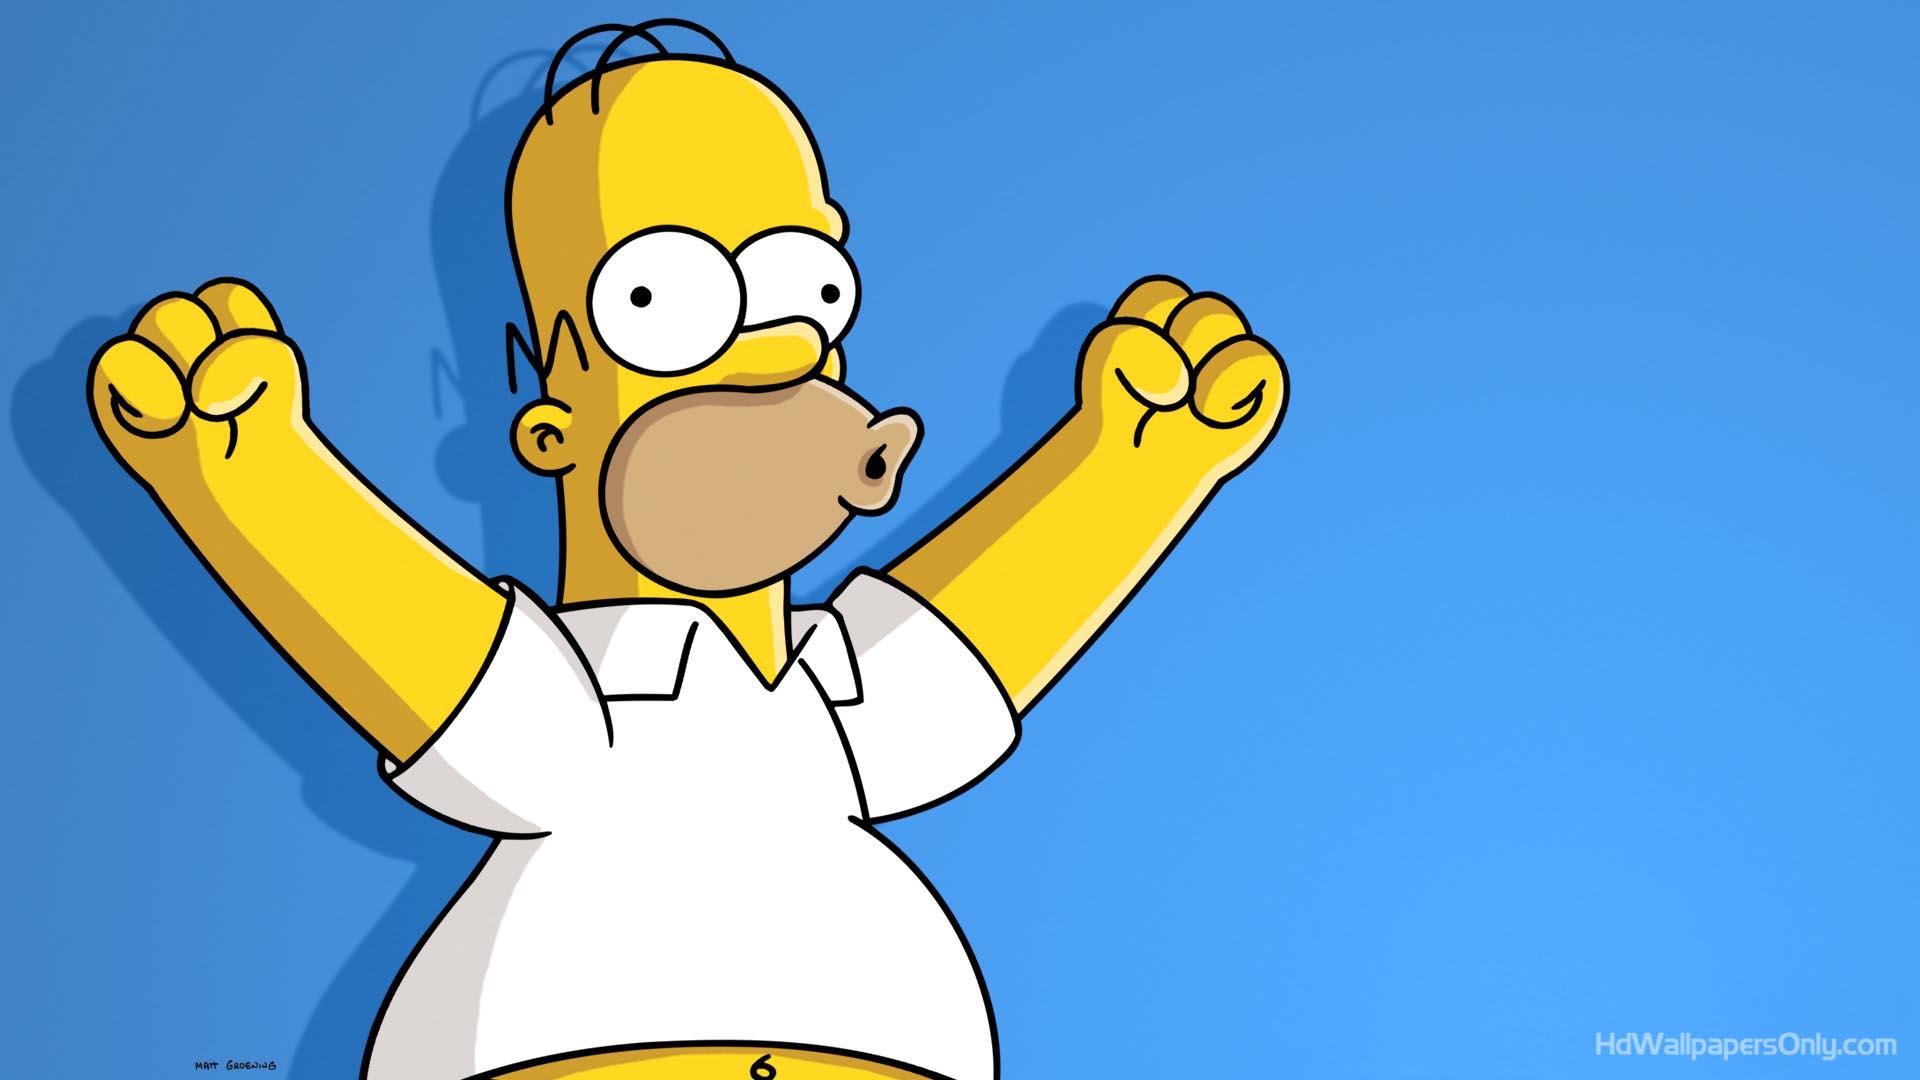 The Simpsons Wallpaper Iphone Mobiles Hd - Homer Simpson 4k - HD Wallpaper